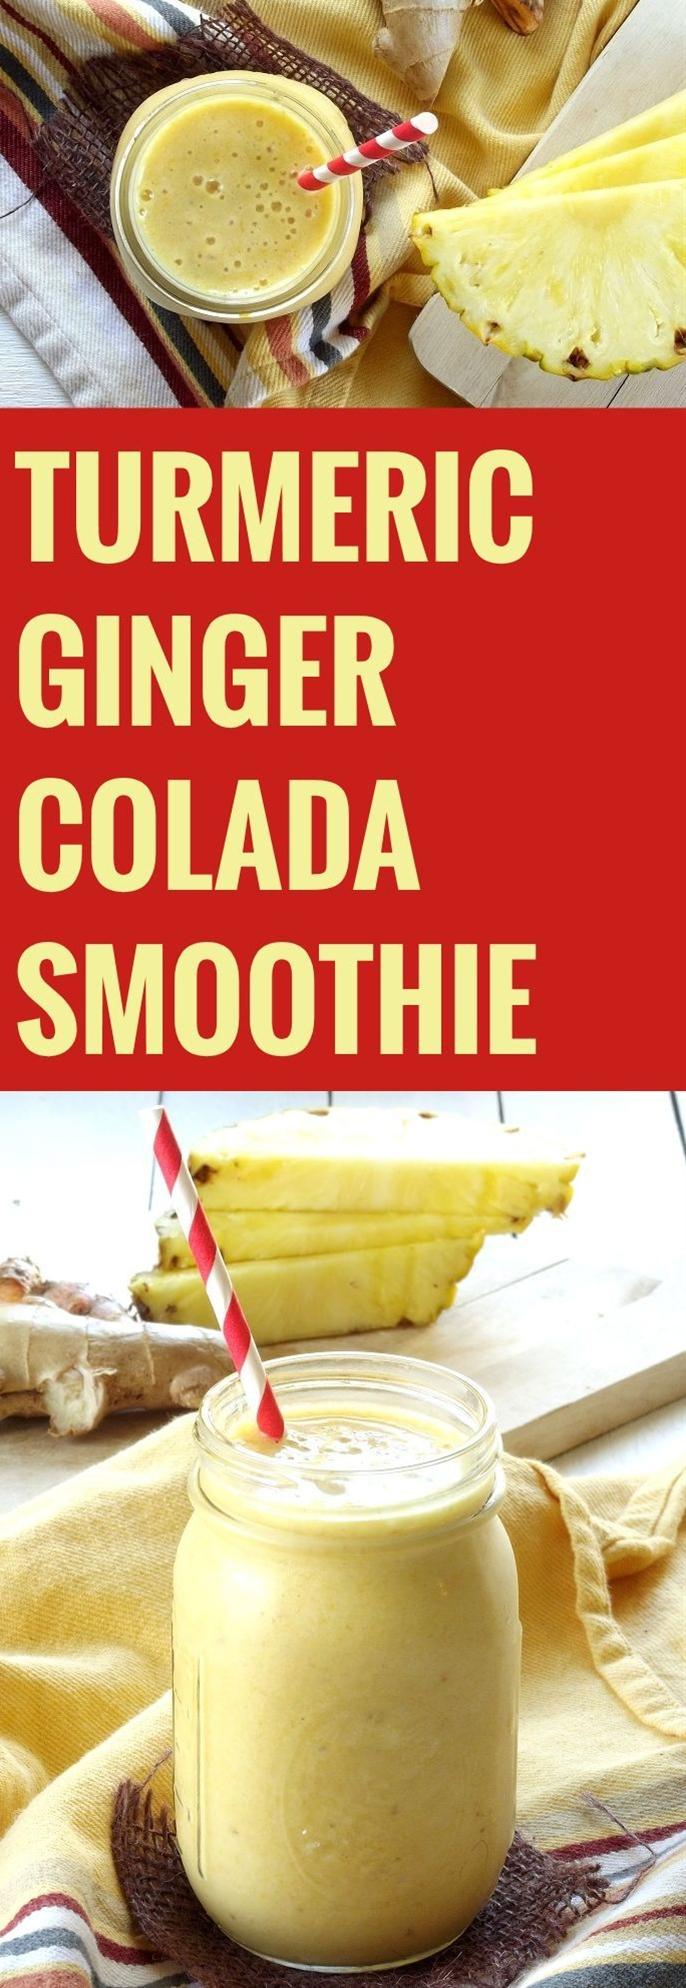 Turmeric Ginger Colada Smoothie